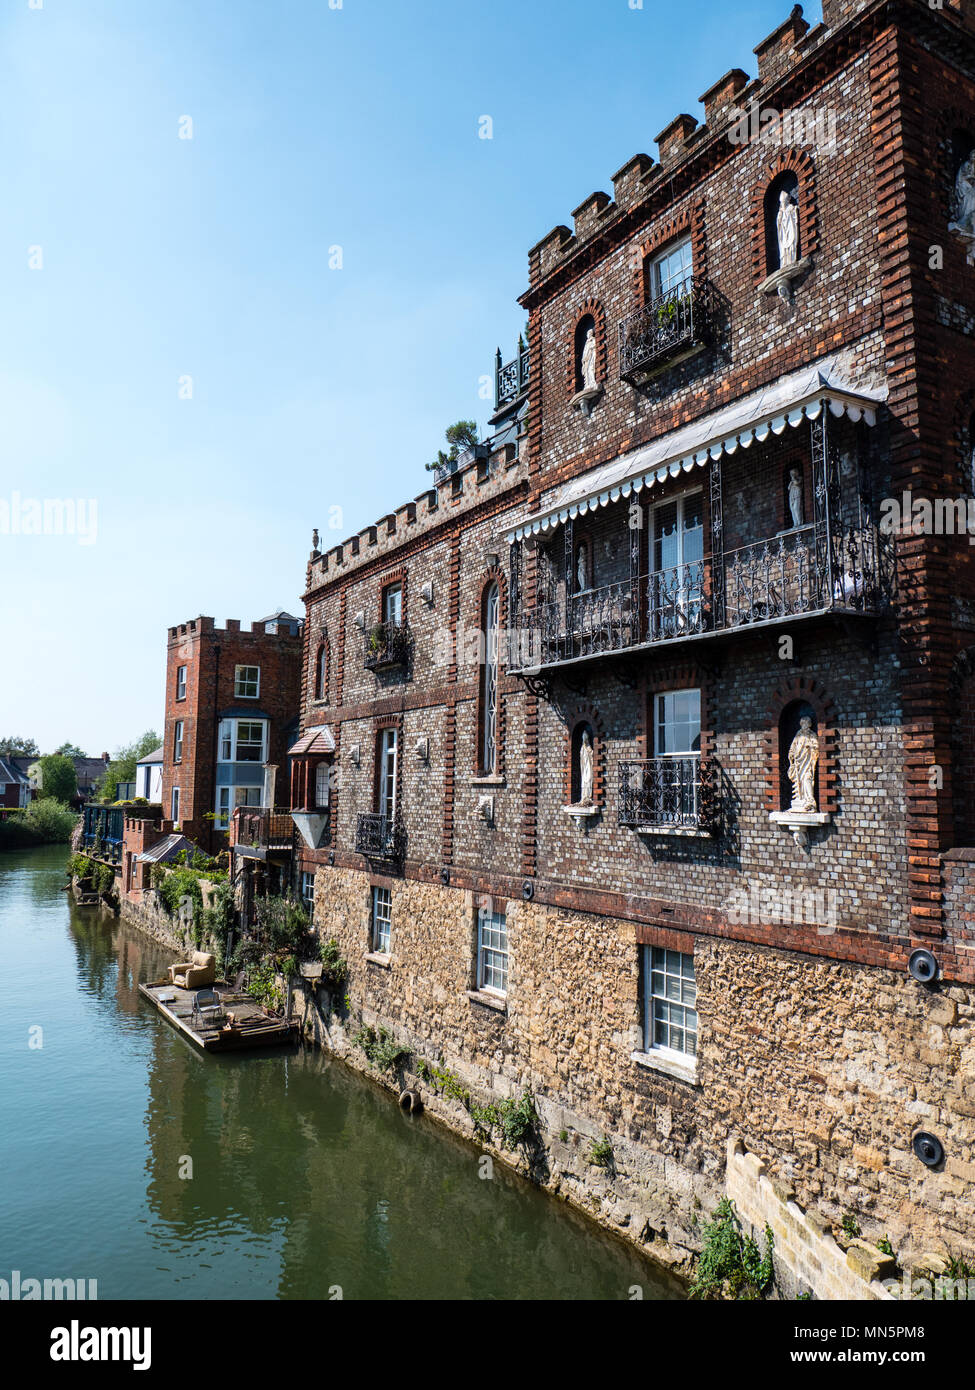 Houses on River Thames nr Folly Bridge, Oxford, Oxfordshire, England, UK, GB. - Stock Image